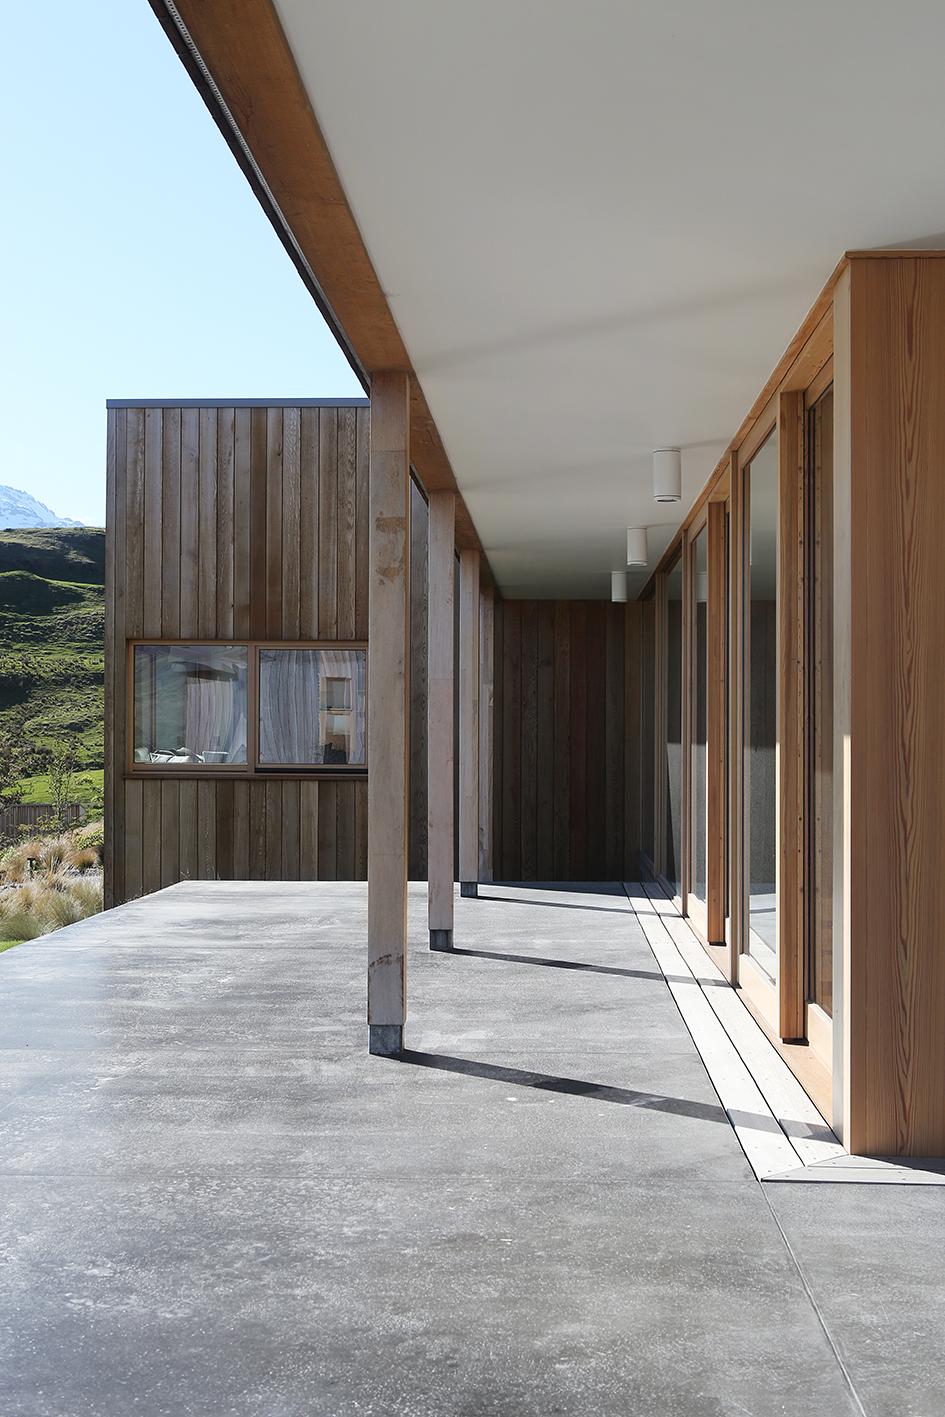 InBedWith_RhiannonTaylor_AroHa_review_newzealand8